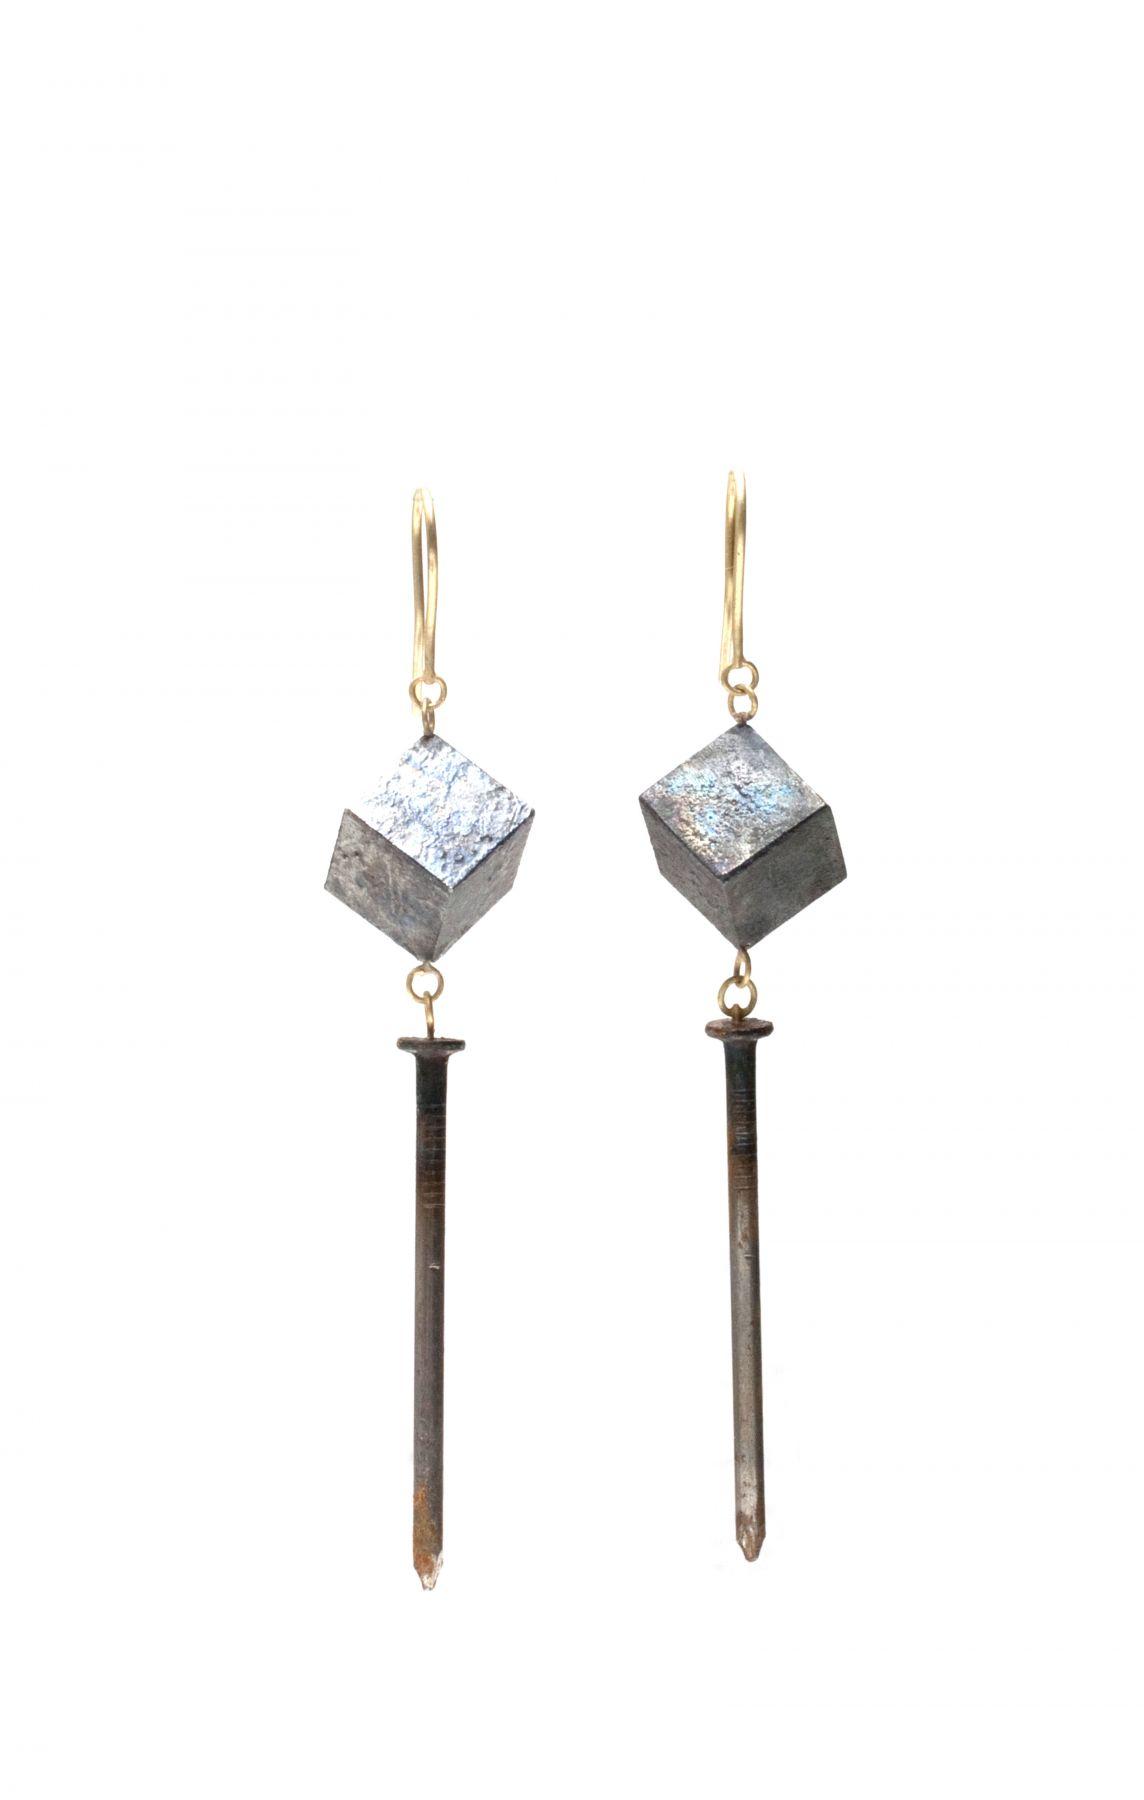 Philip Sajet earrings